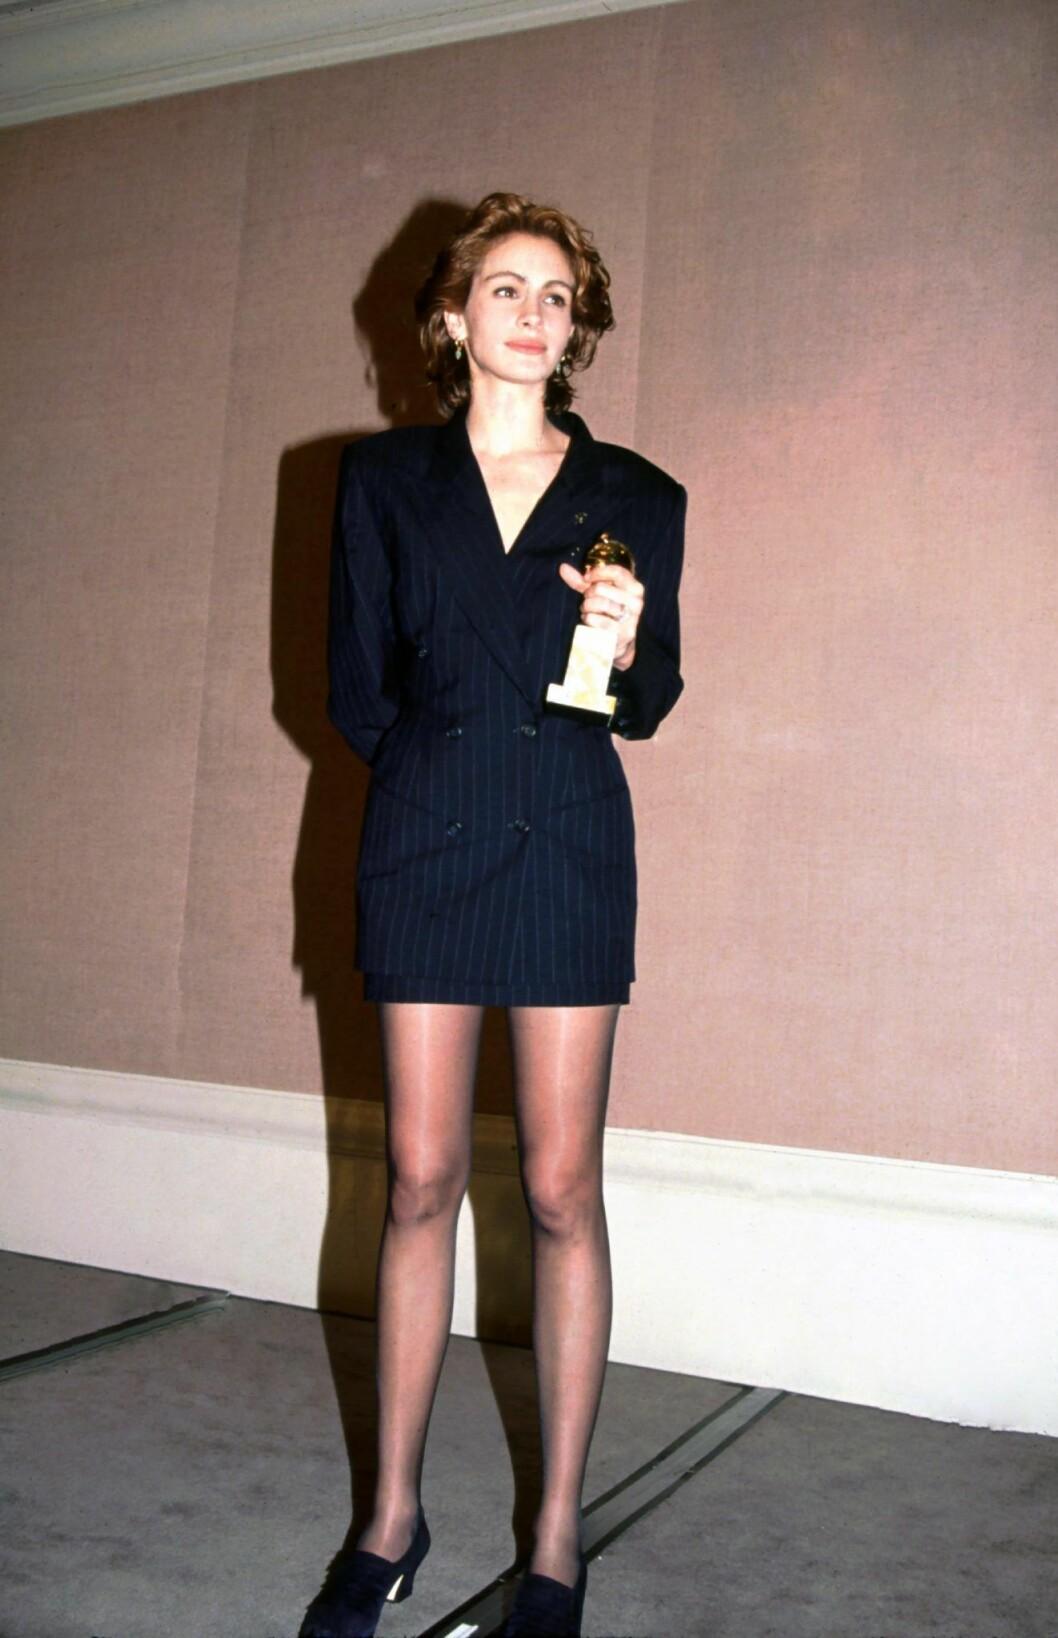 Julia Roberts 90-tals stil